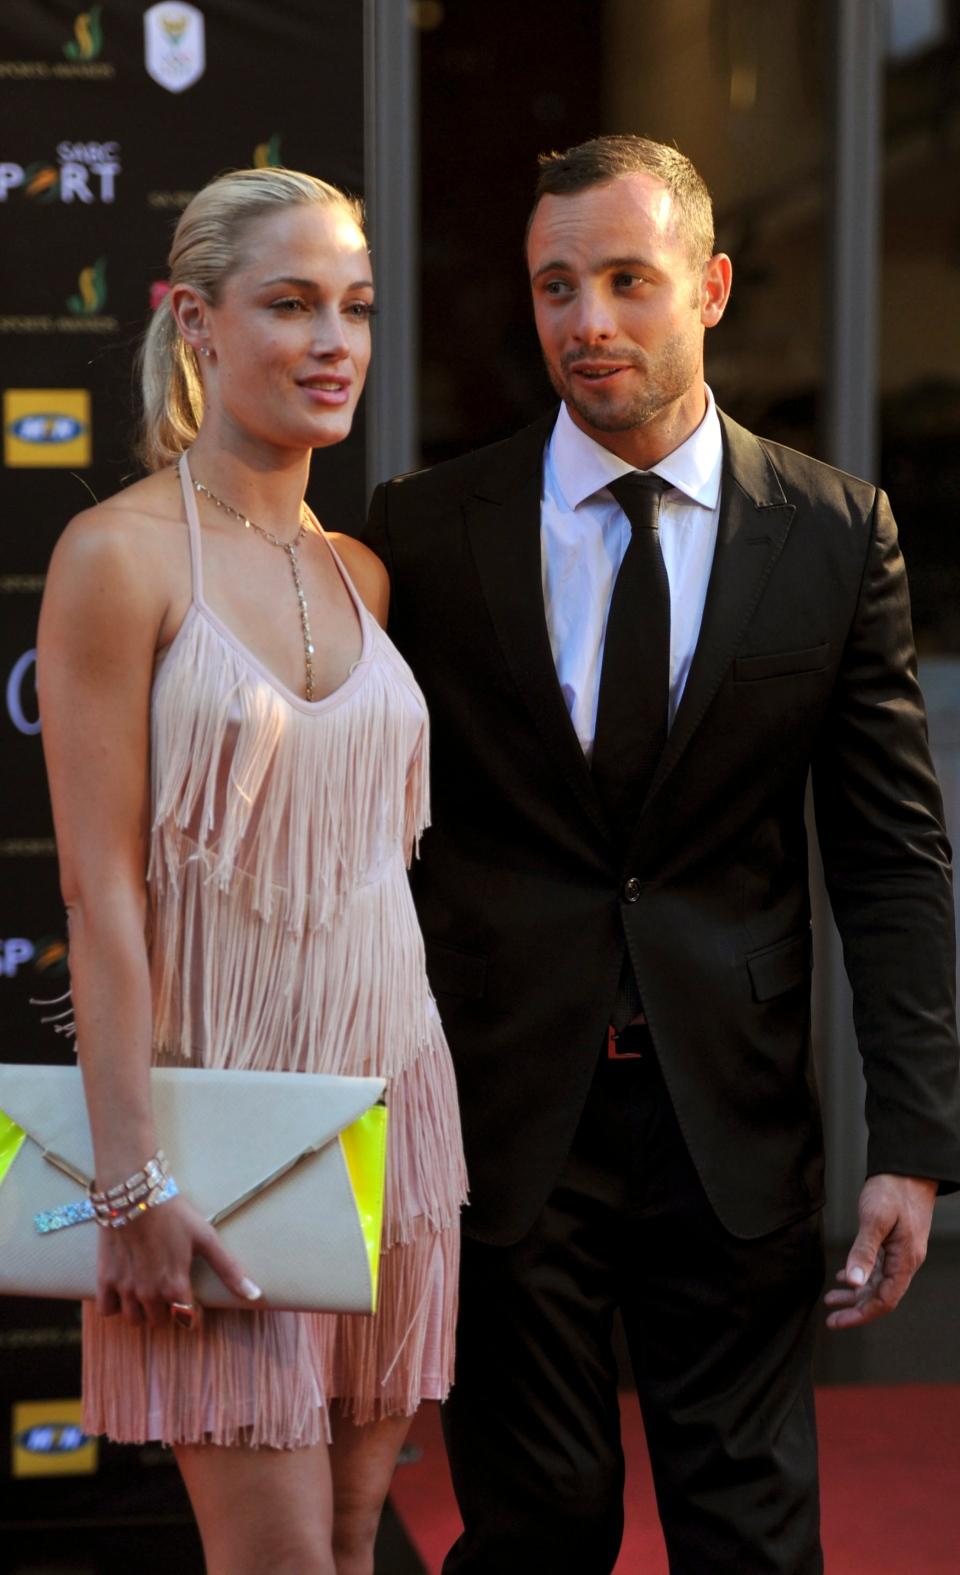 Olympic athlete Oscar Pistorius and model Reeva Steenkamp attend an awards ceremony in Johannesburg, South Africa, Nov. 4, 2012. (Lucky Nxumalo / Citypress)